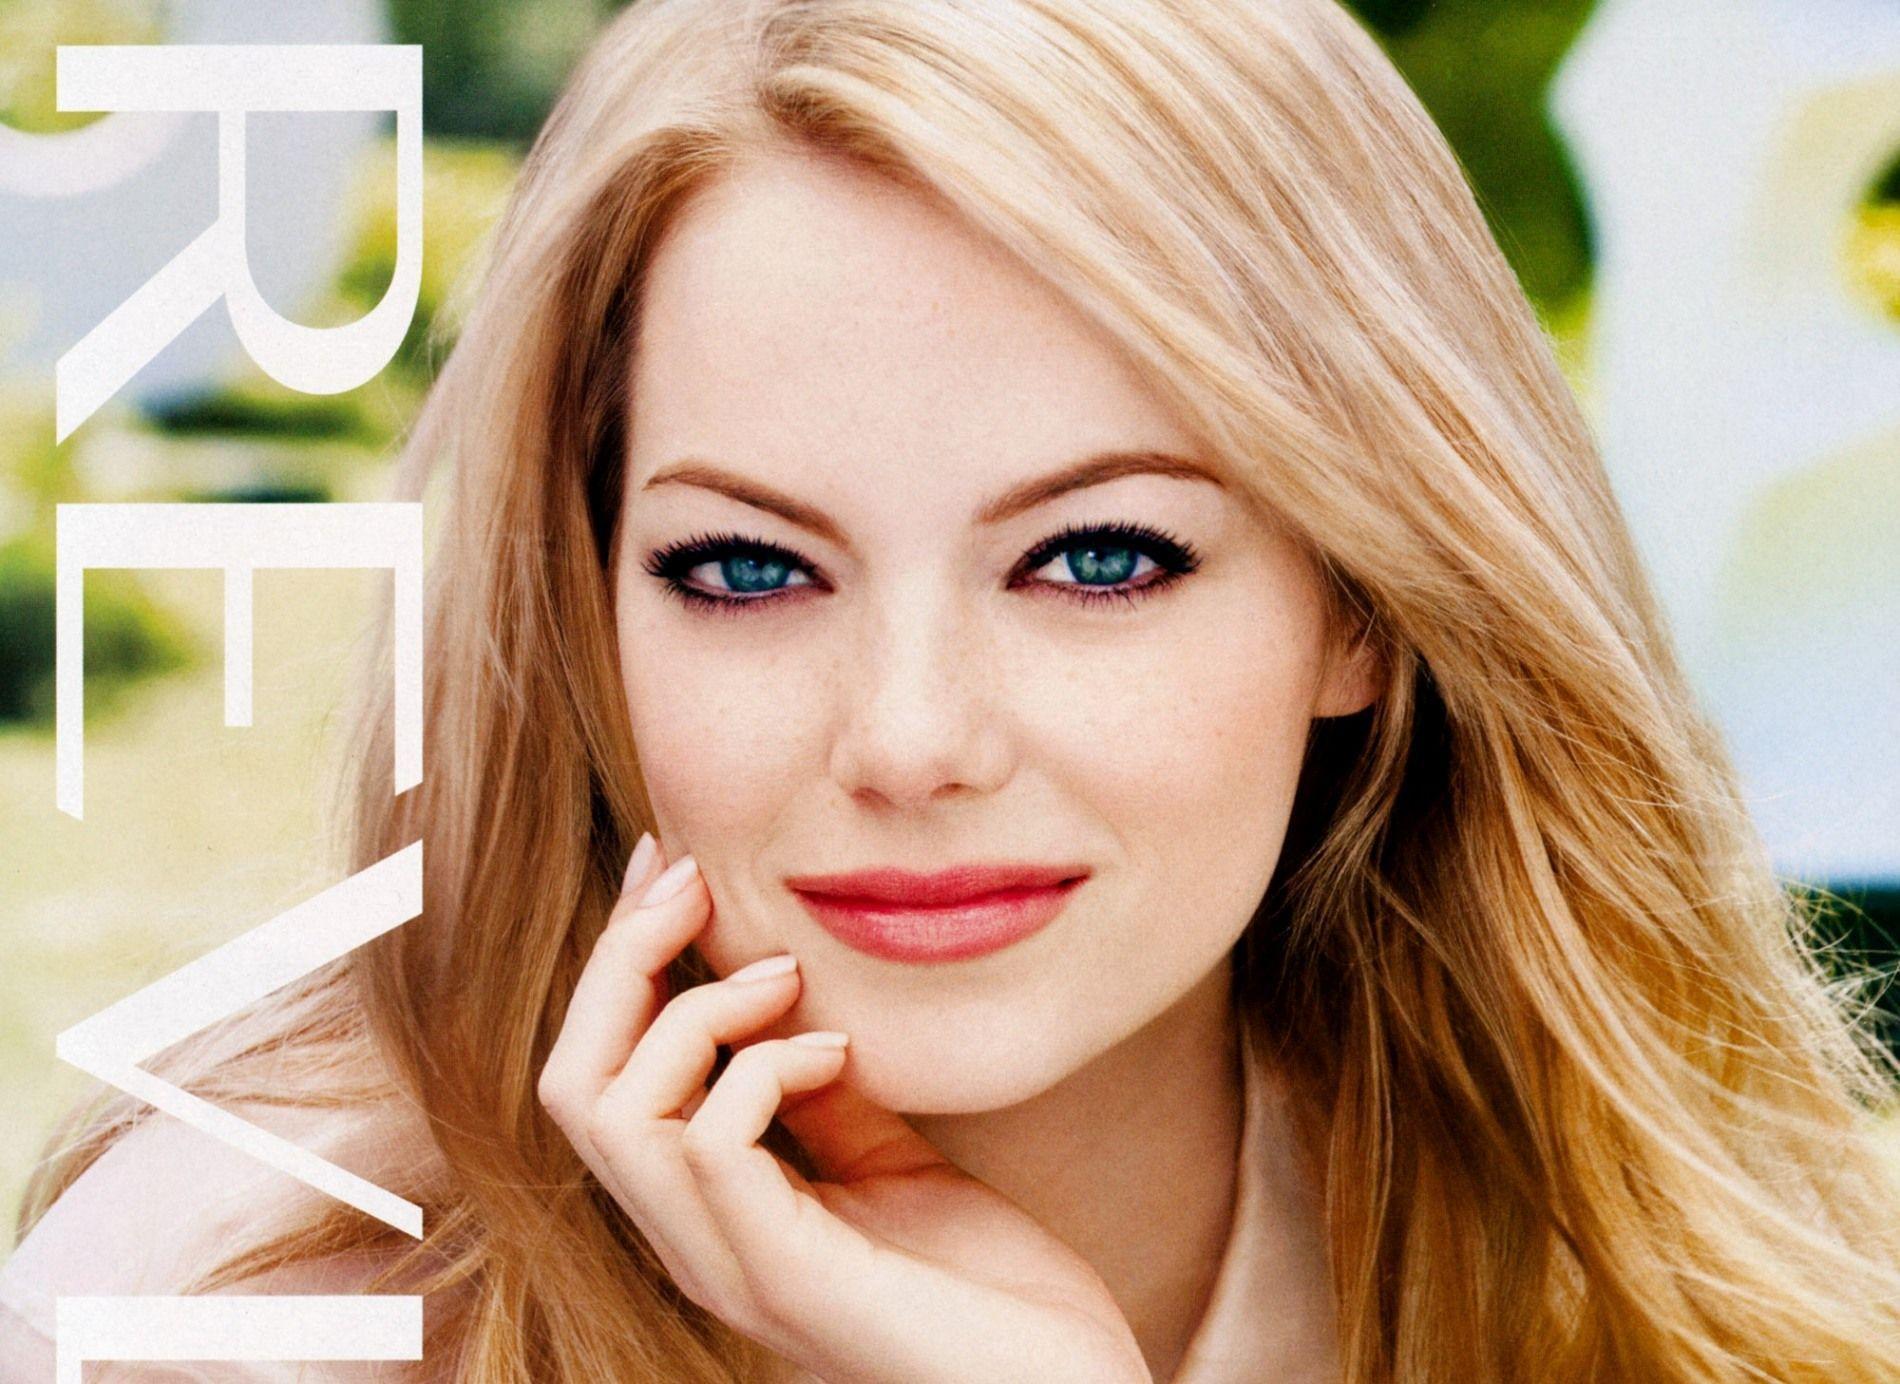 Emma Stone HD wallpaper #8 - Apnatimepass.com